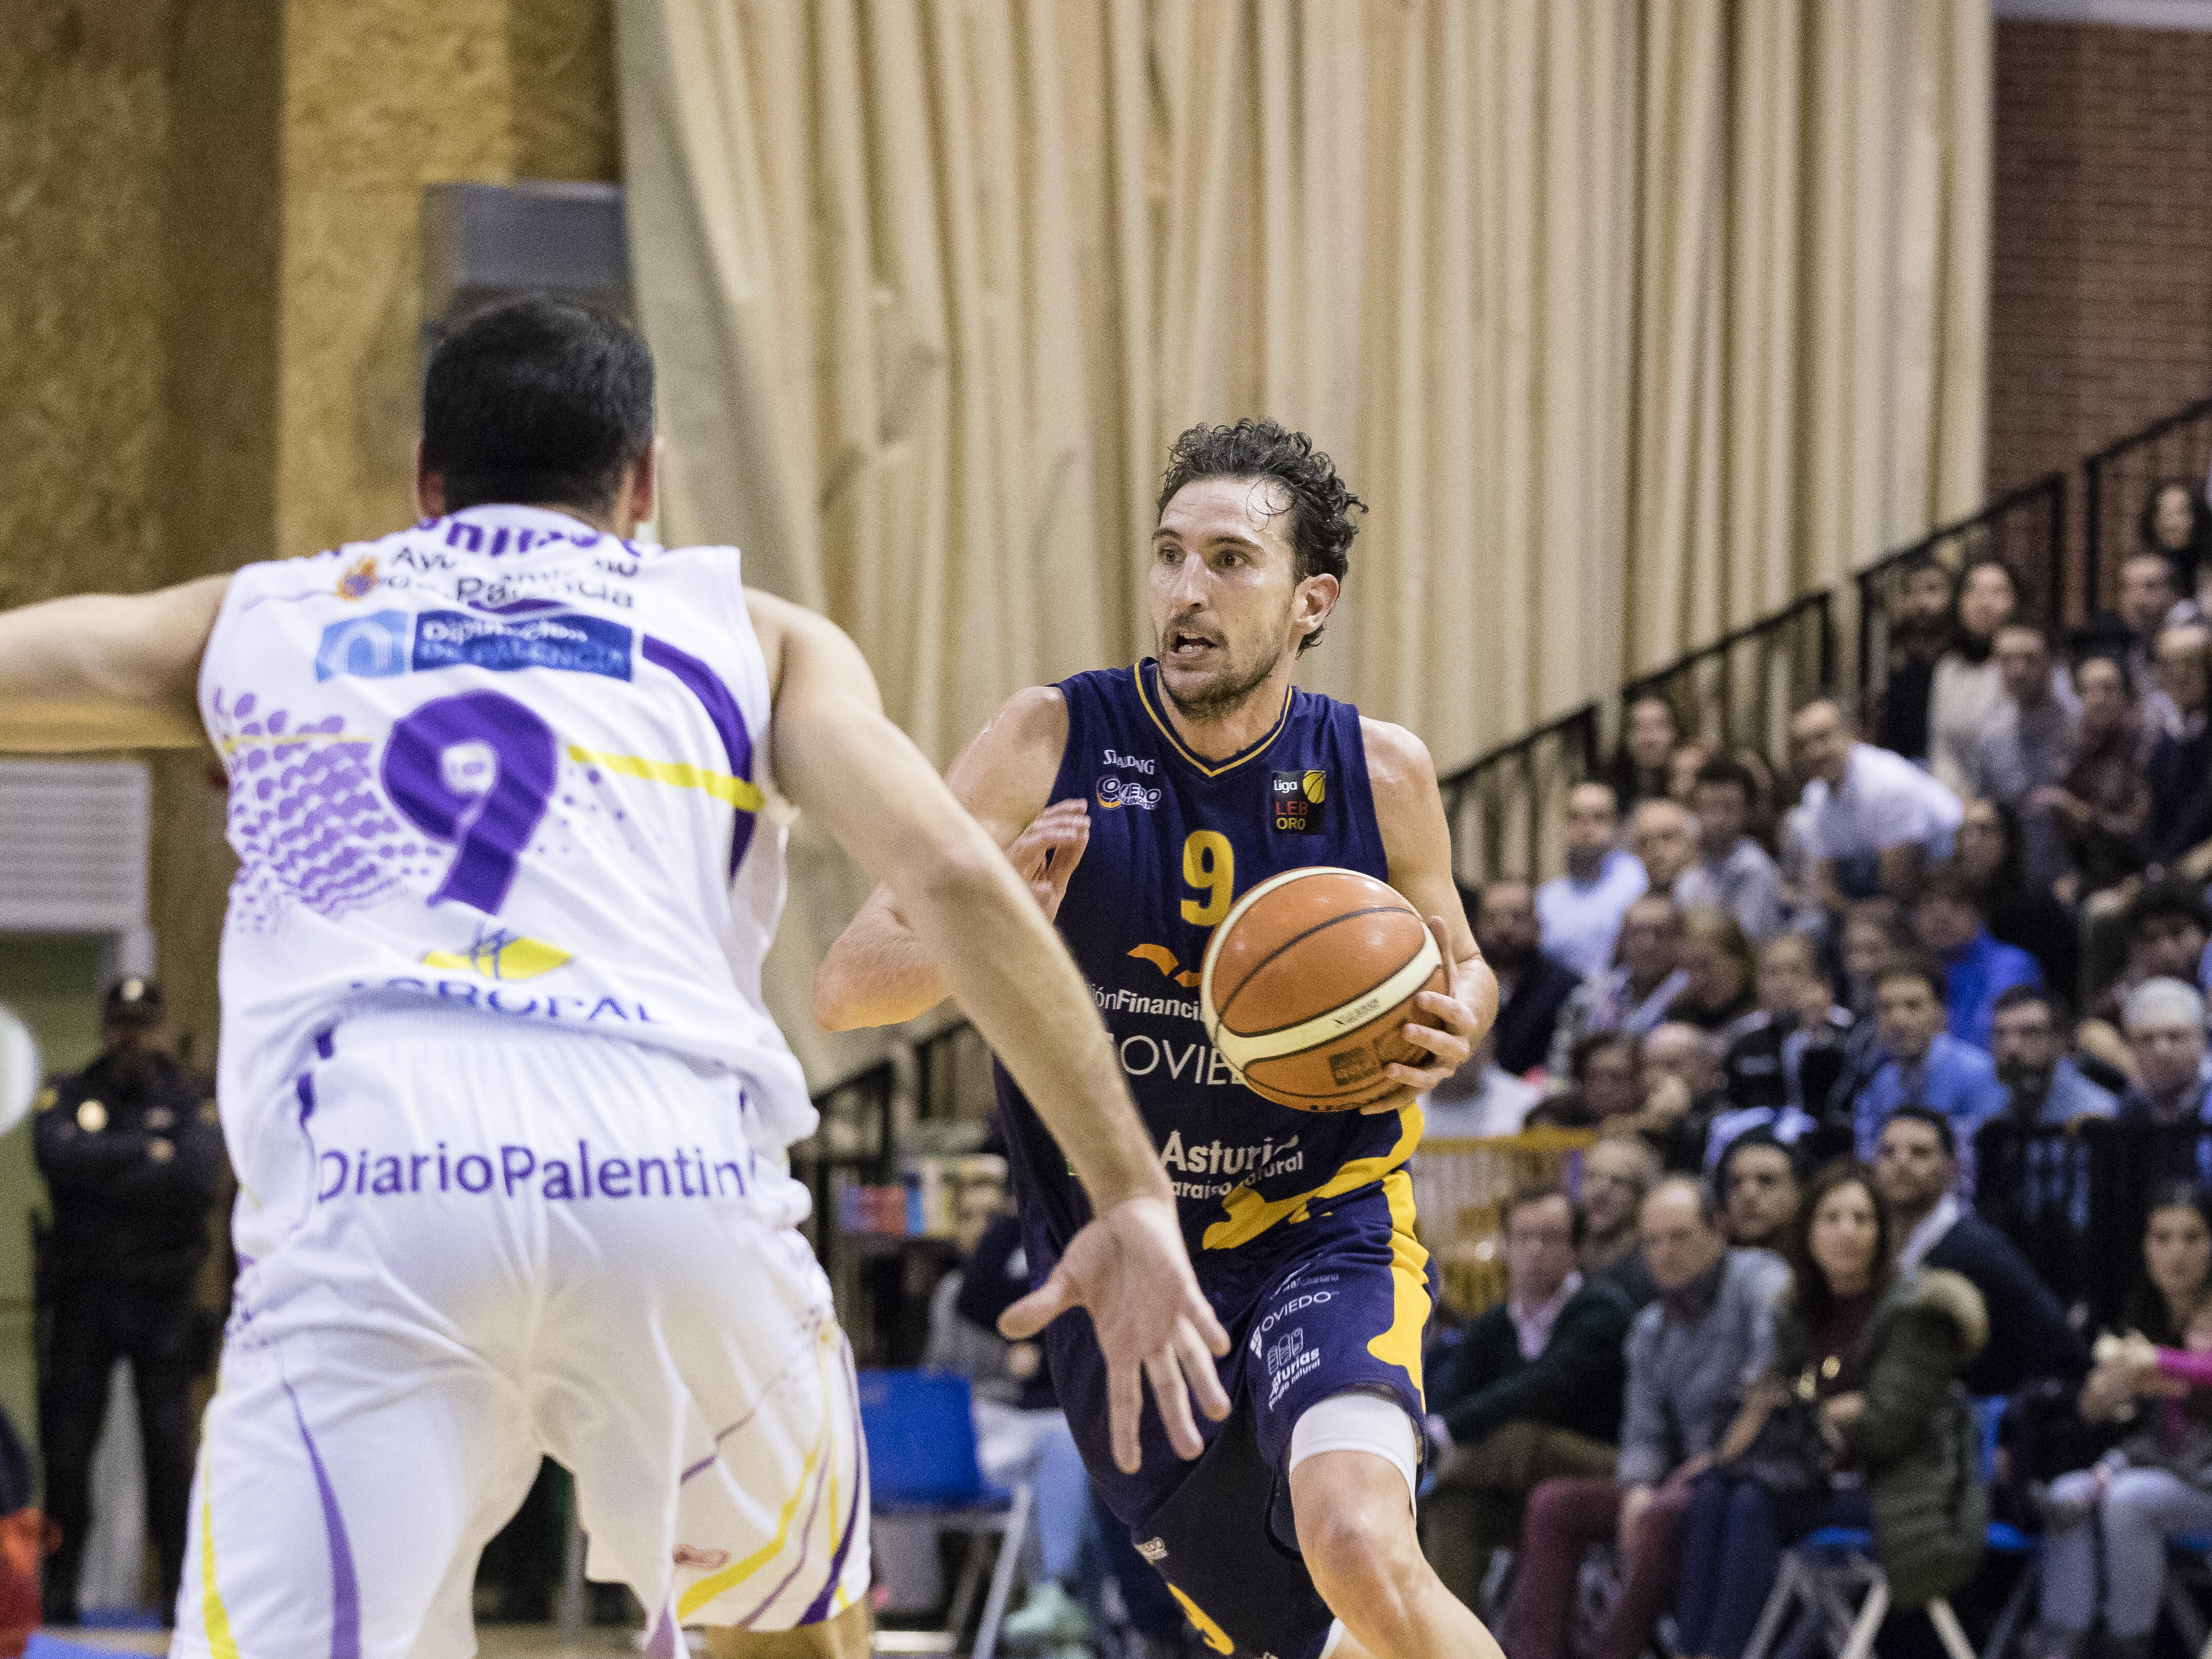 Víctor Pérez al contraataque (Foto: Christian García)